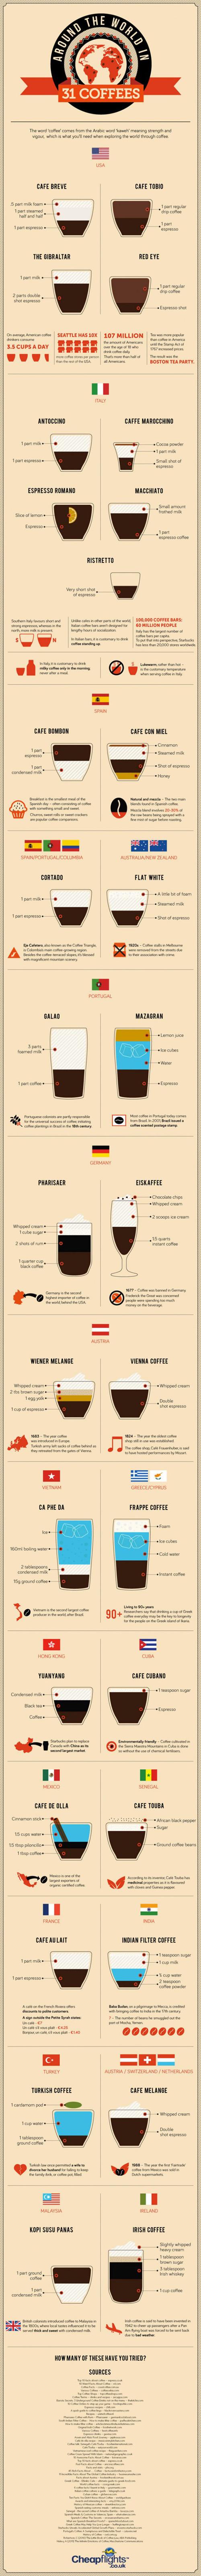 coffeeinfo